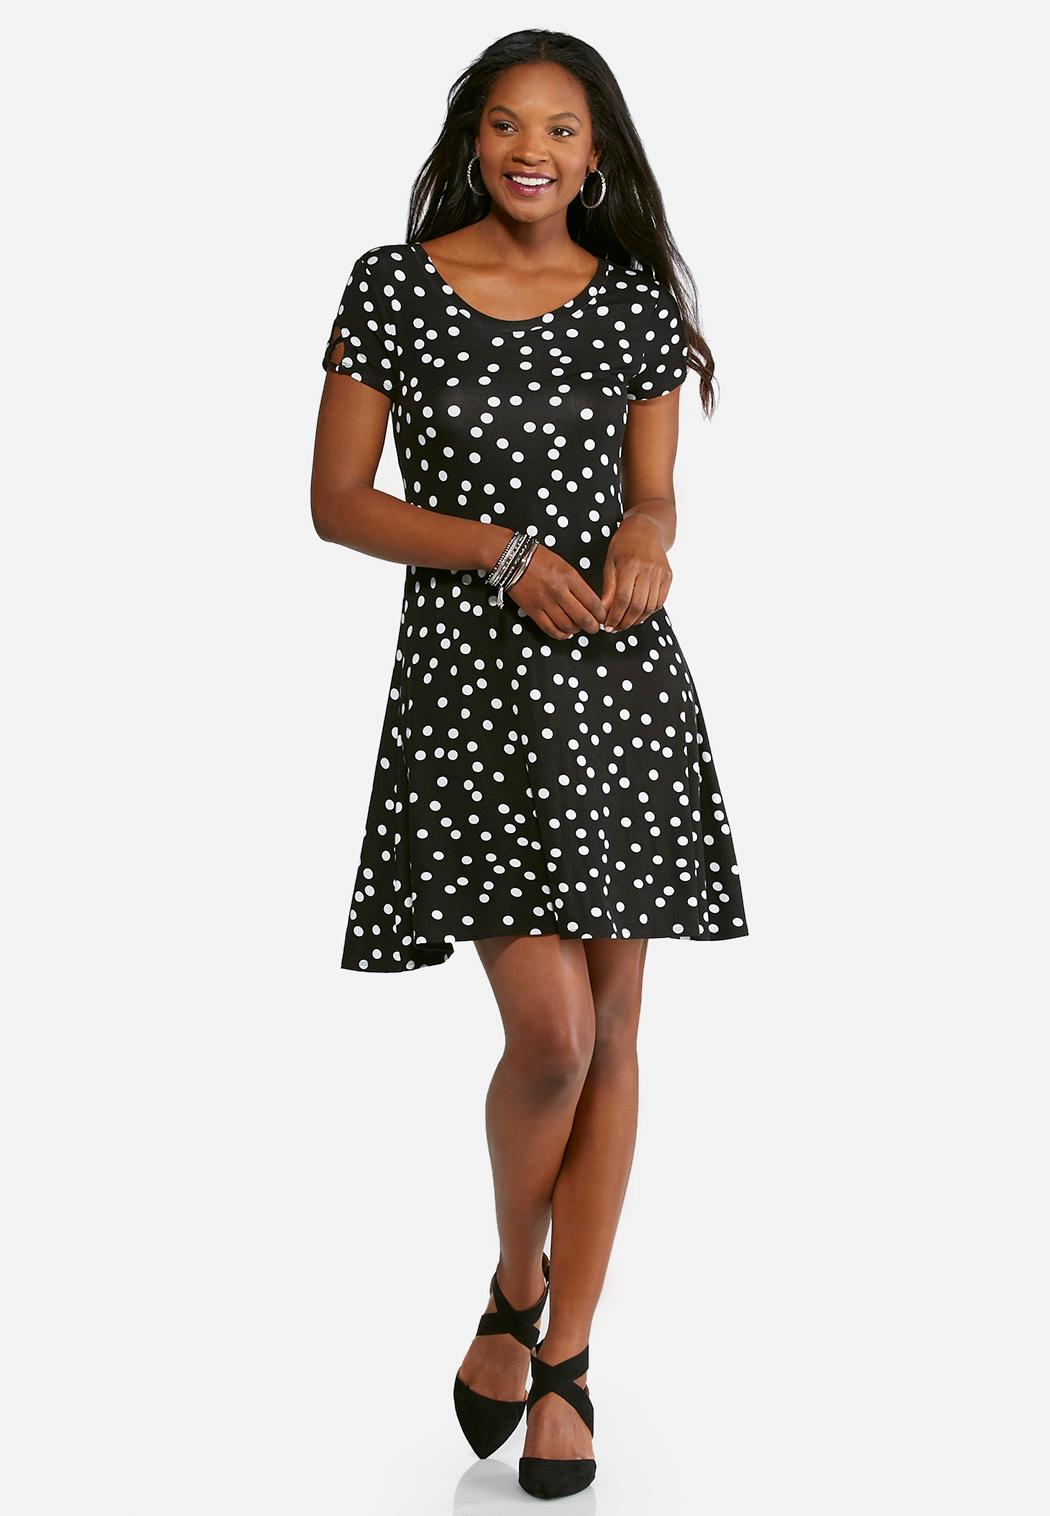 Plus Size Polka Dot Swing Dress Plus Sizes Cato Fashions